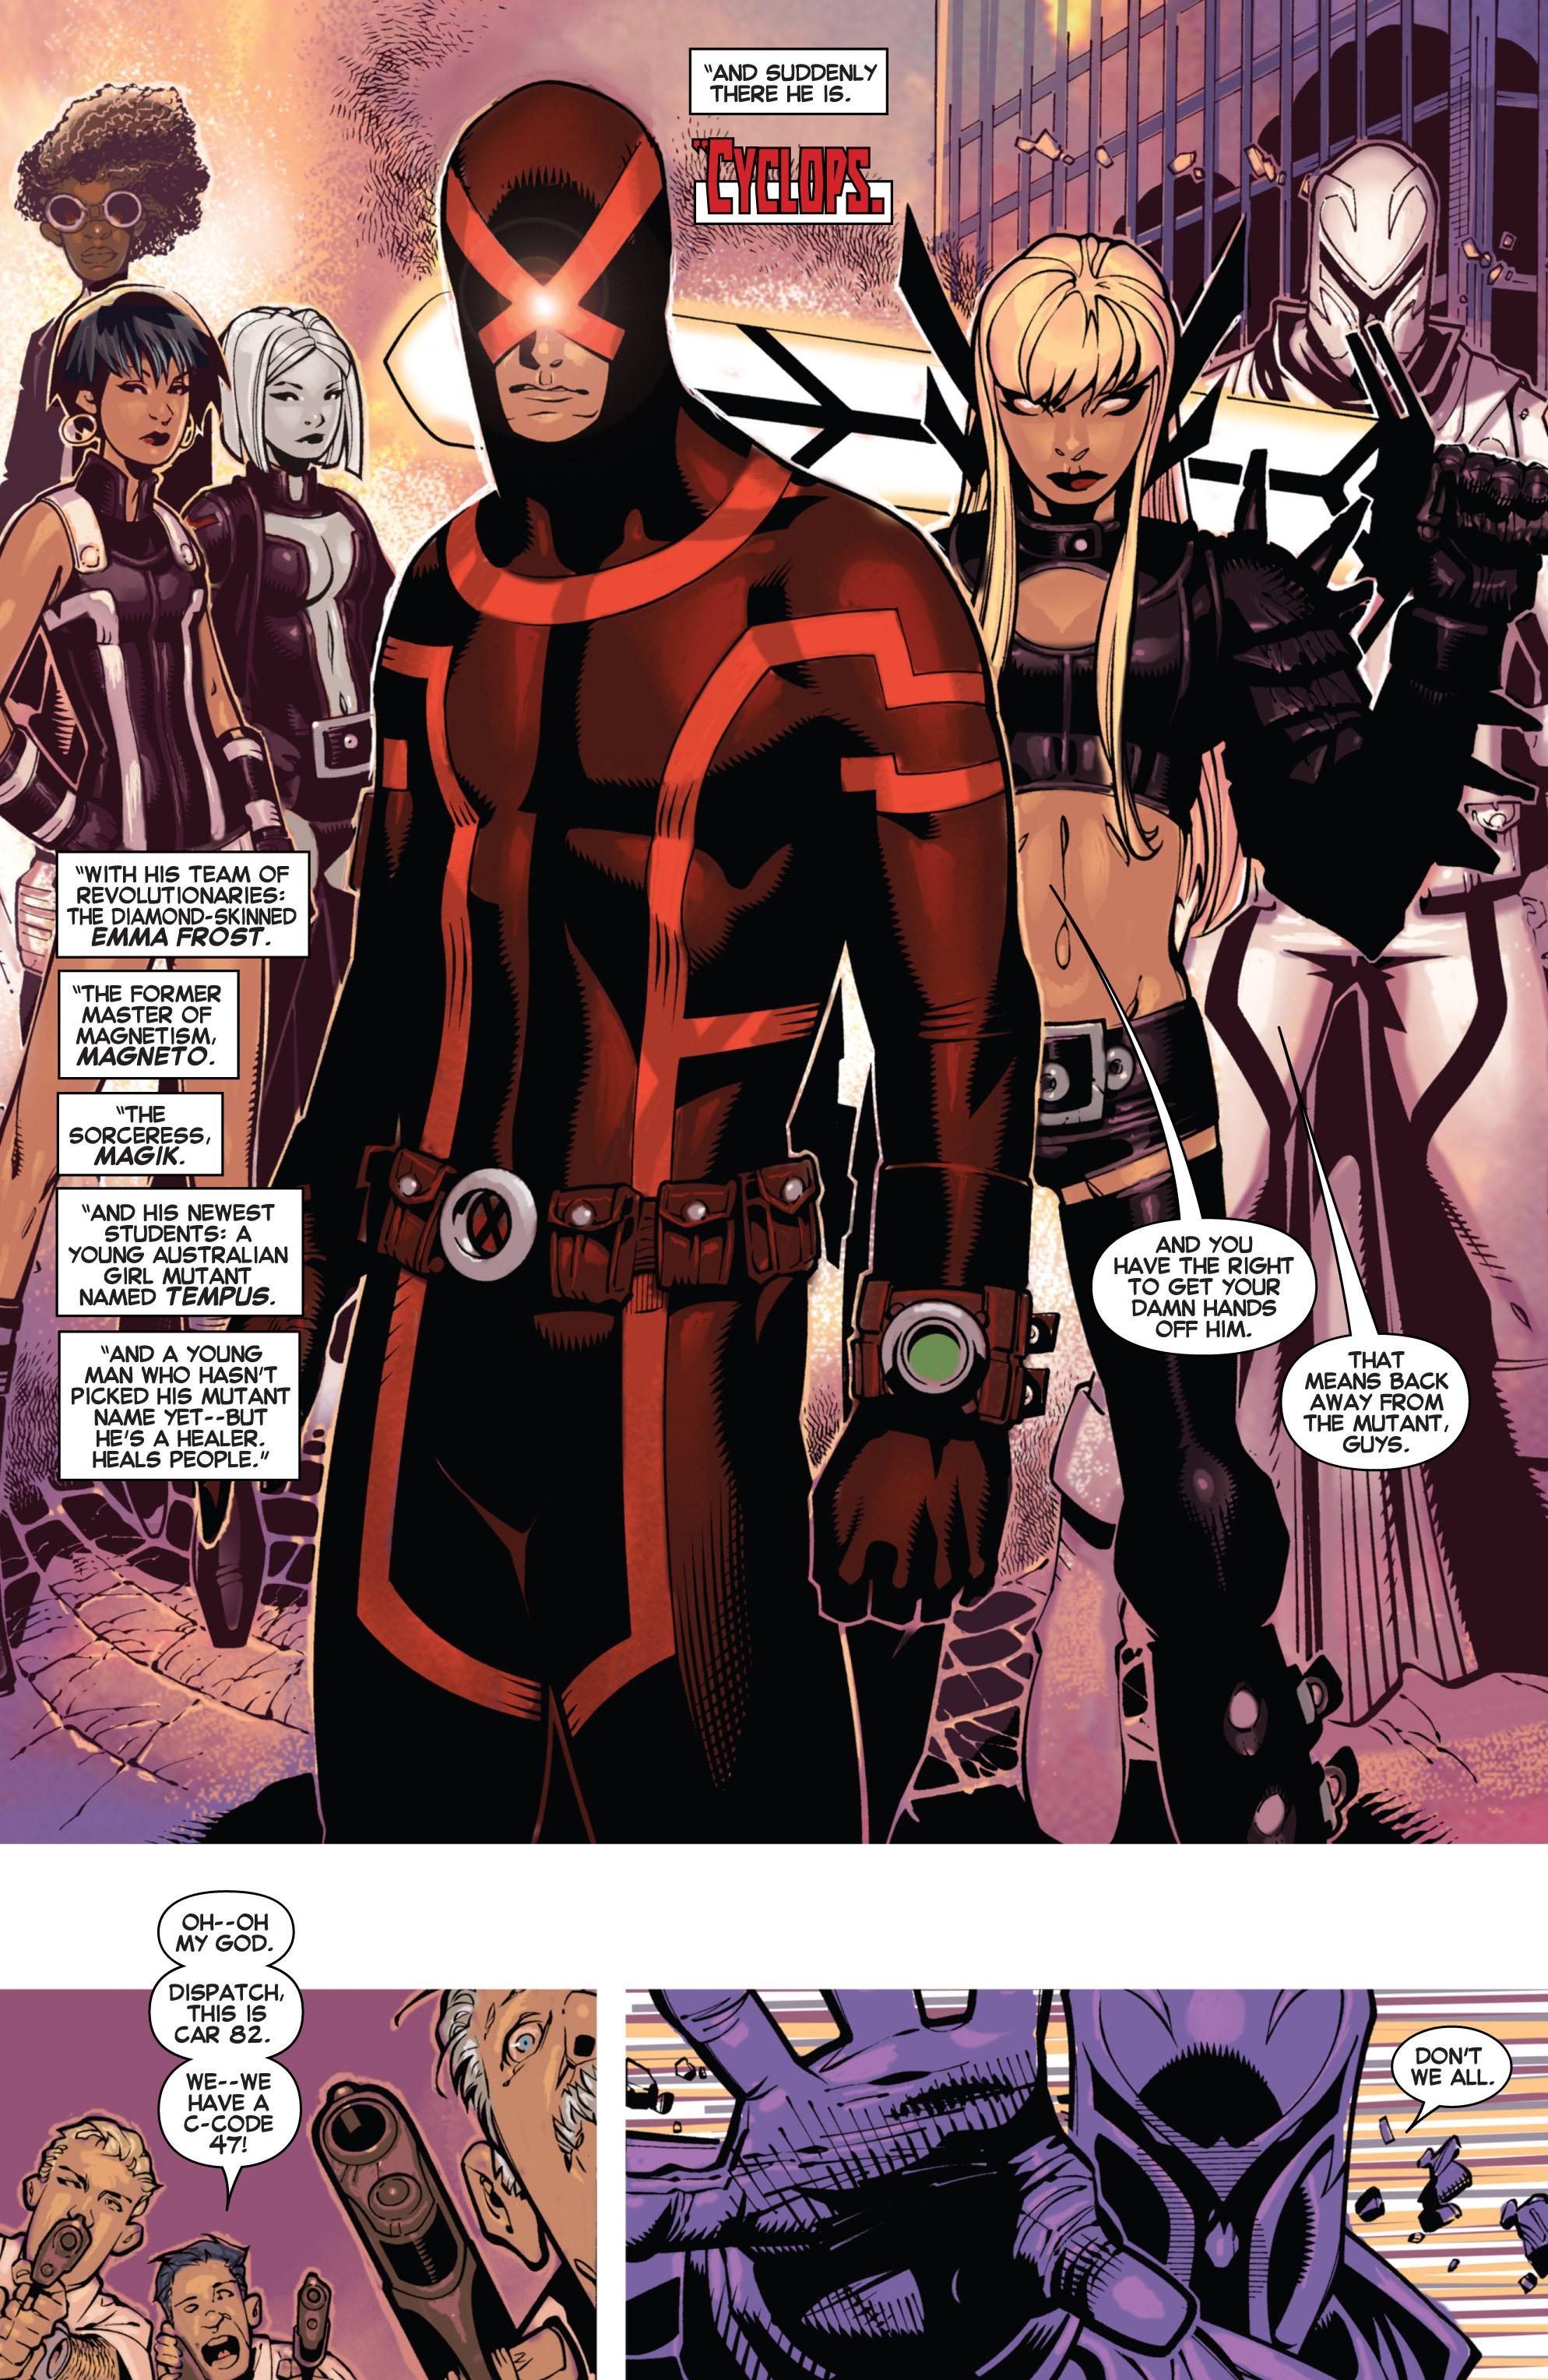 Read online Uncanny X-Men (2013) comic -  Issue # _TPB 1 - Revolution - 13